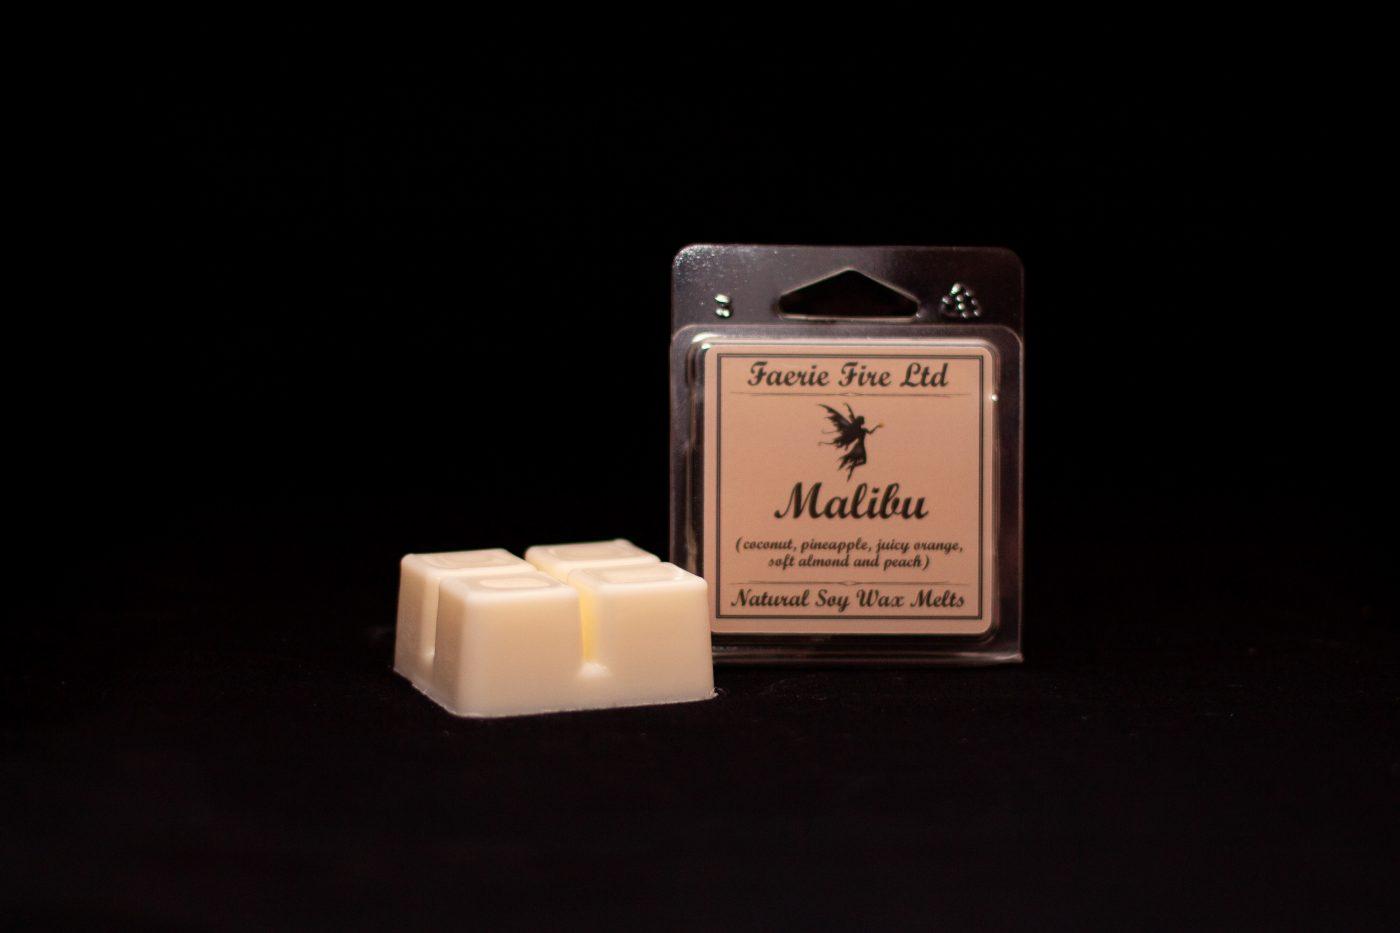 Malibu Small Clam scaled